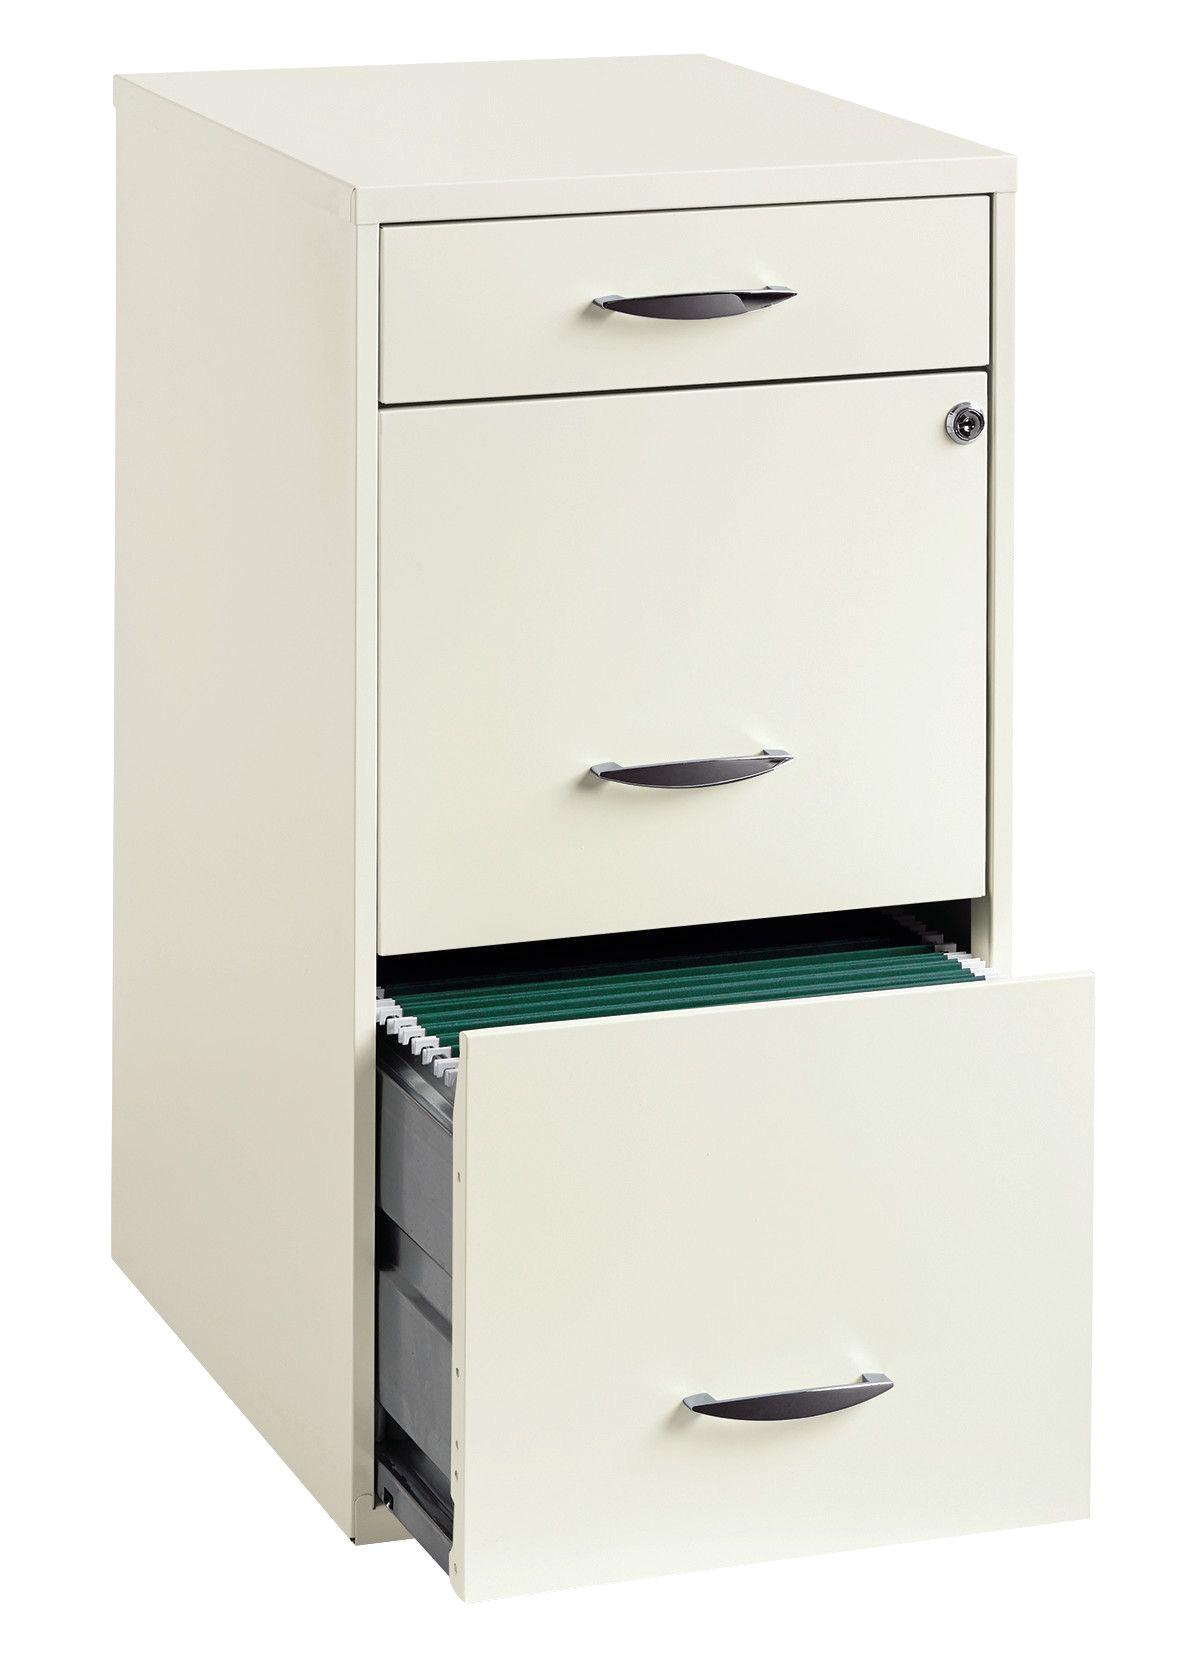 commclad steel 3 drawer filing cabinet reviews wayfair